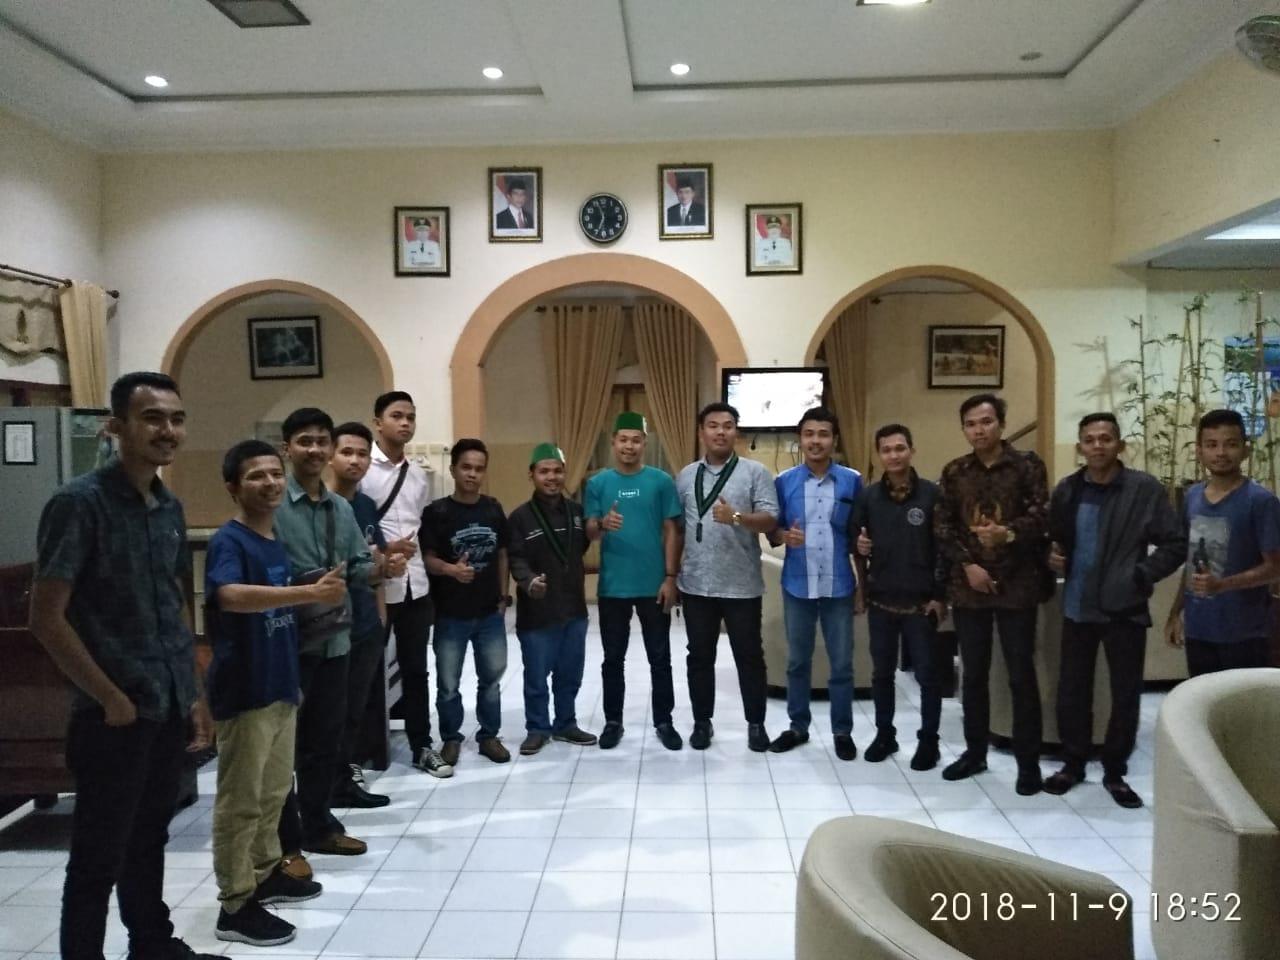 Musda Badko Riau-Kepri IX Hoax??